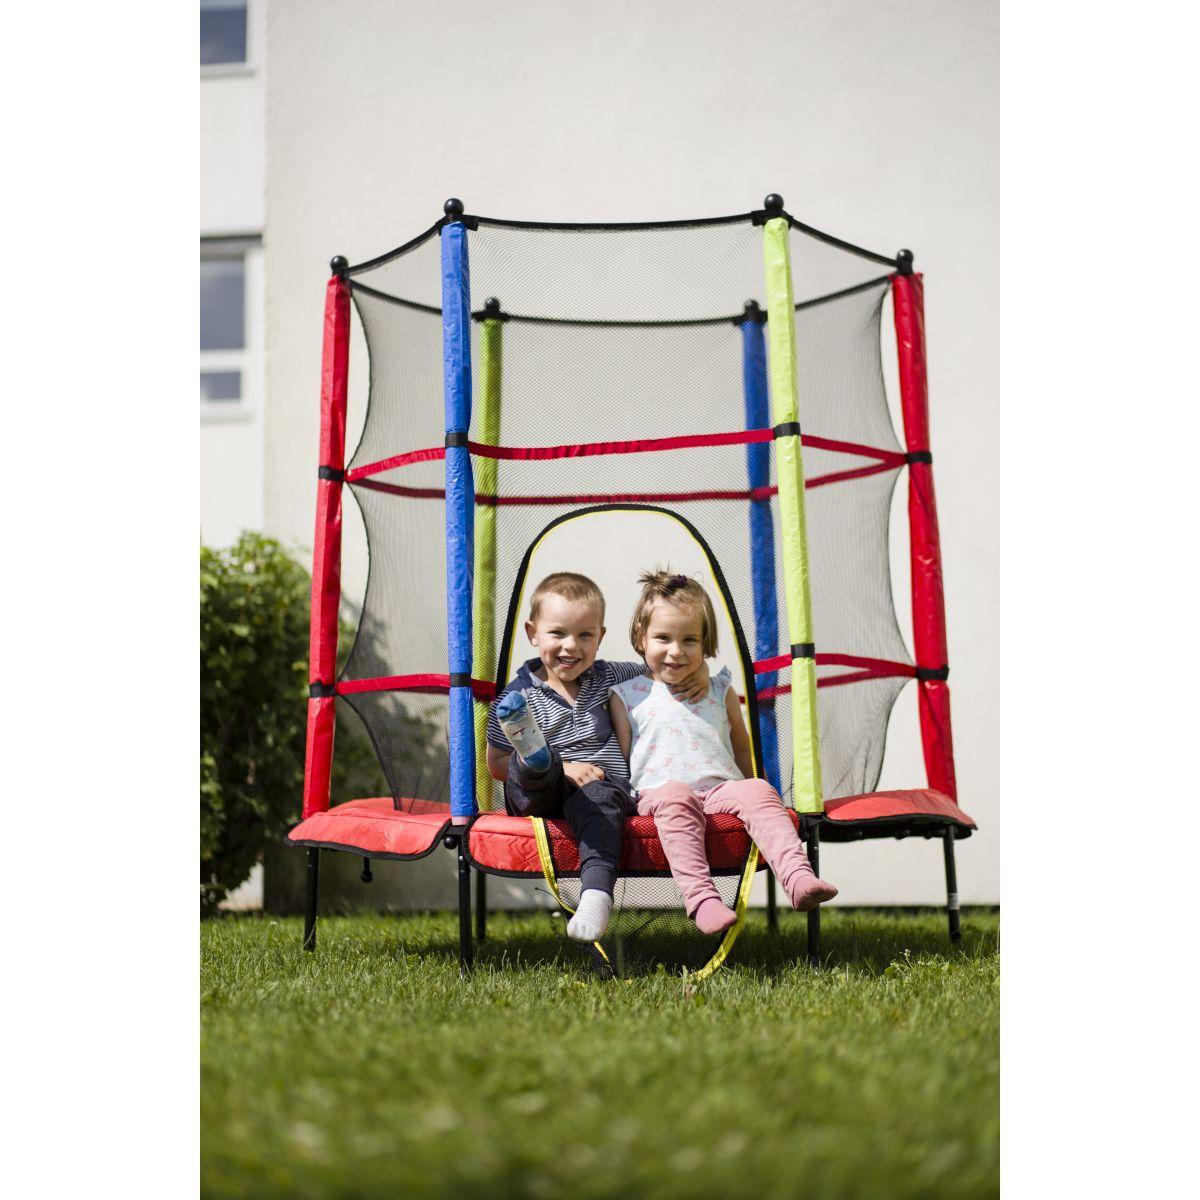 outdoor garten trampolin 140 cm f r kinder komplettset mit. Black Bedroom Furniture Sets. Home Design Ideas